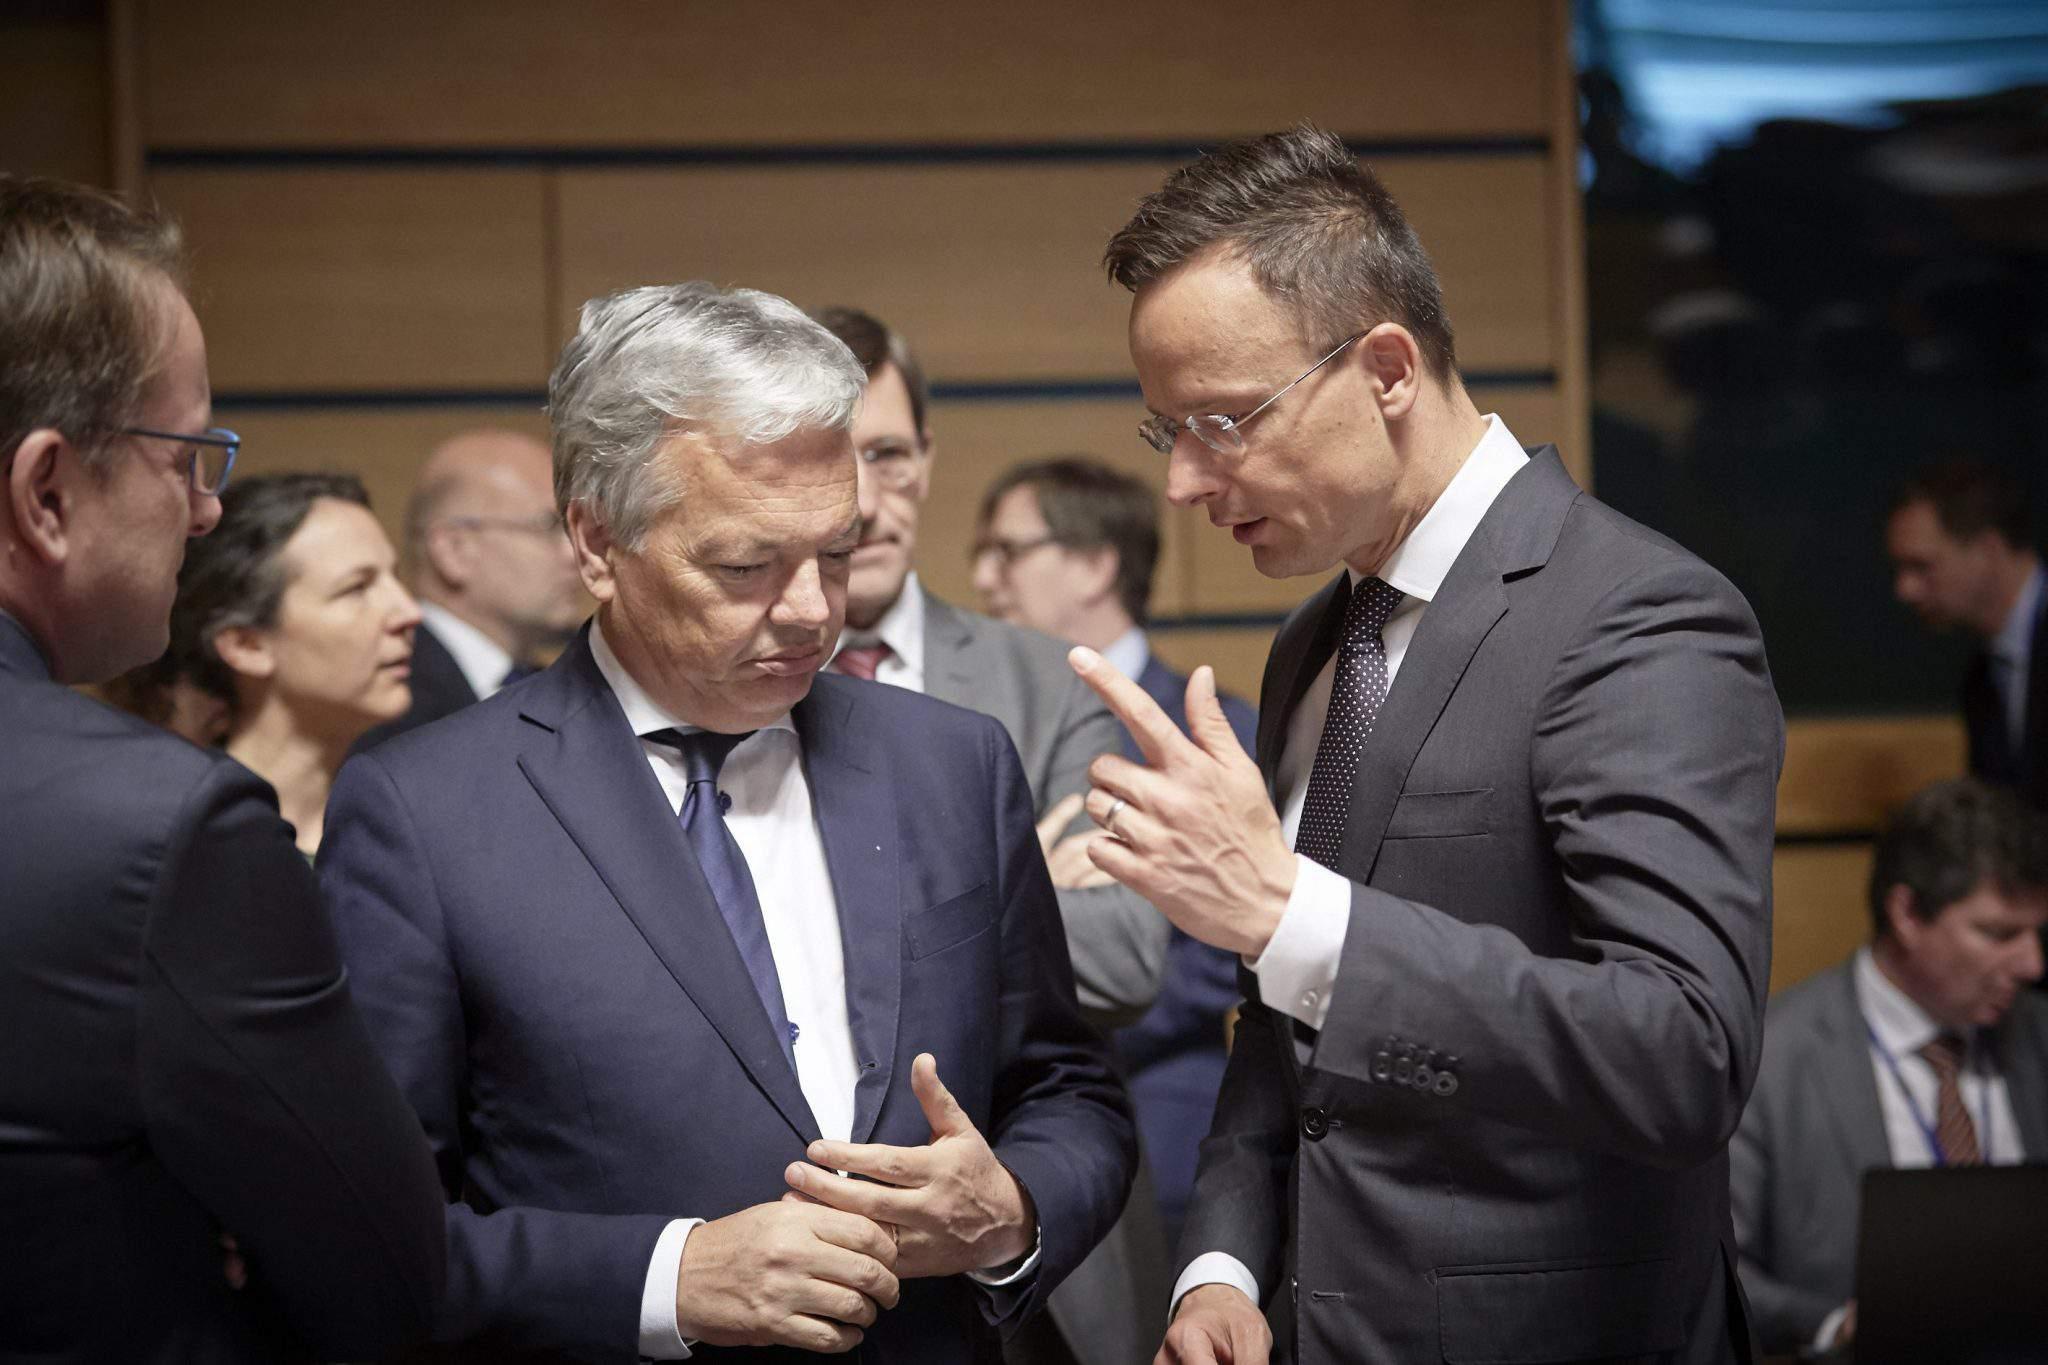 REYNDERS, Didier; SZIJJÁRTÓ Péter Hungarian Foreign Minister